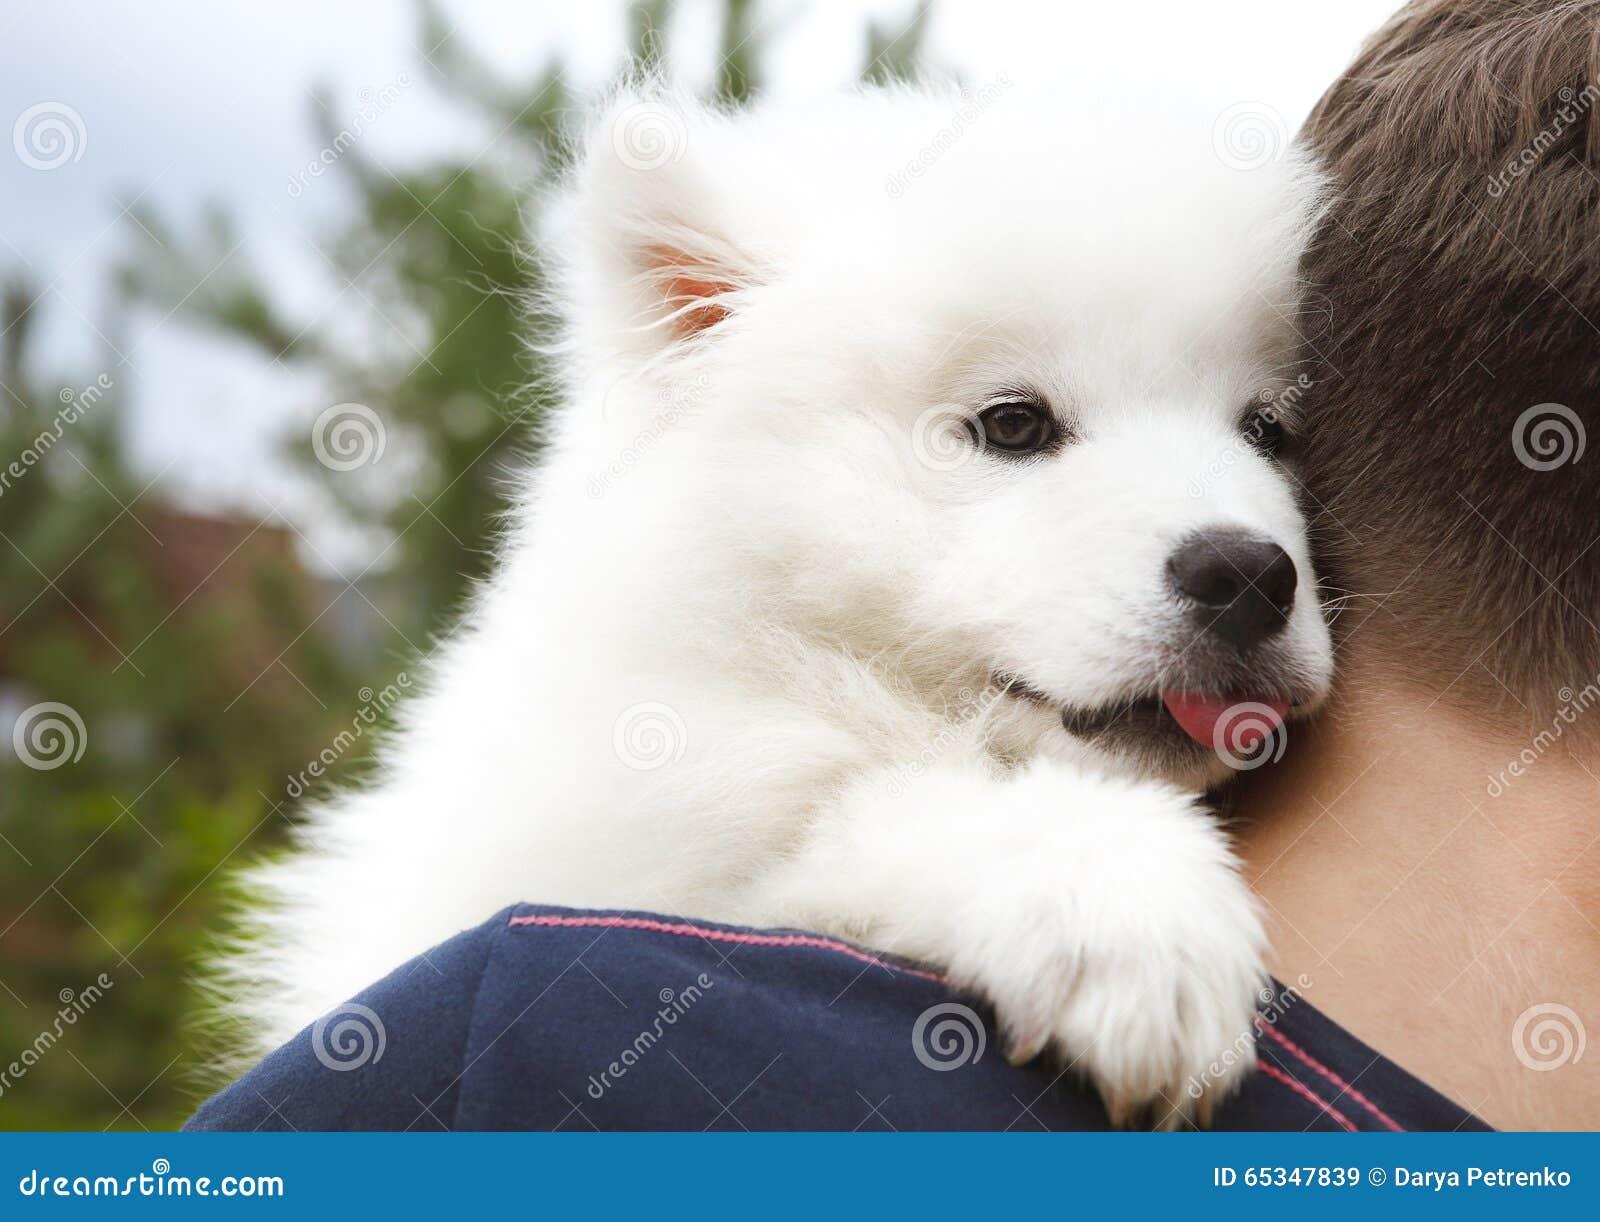 Boy Holding Samoyed Puppy In The Summer Garden Stock Photo